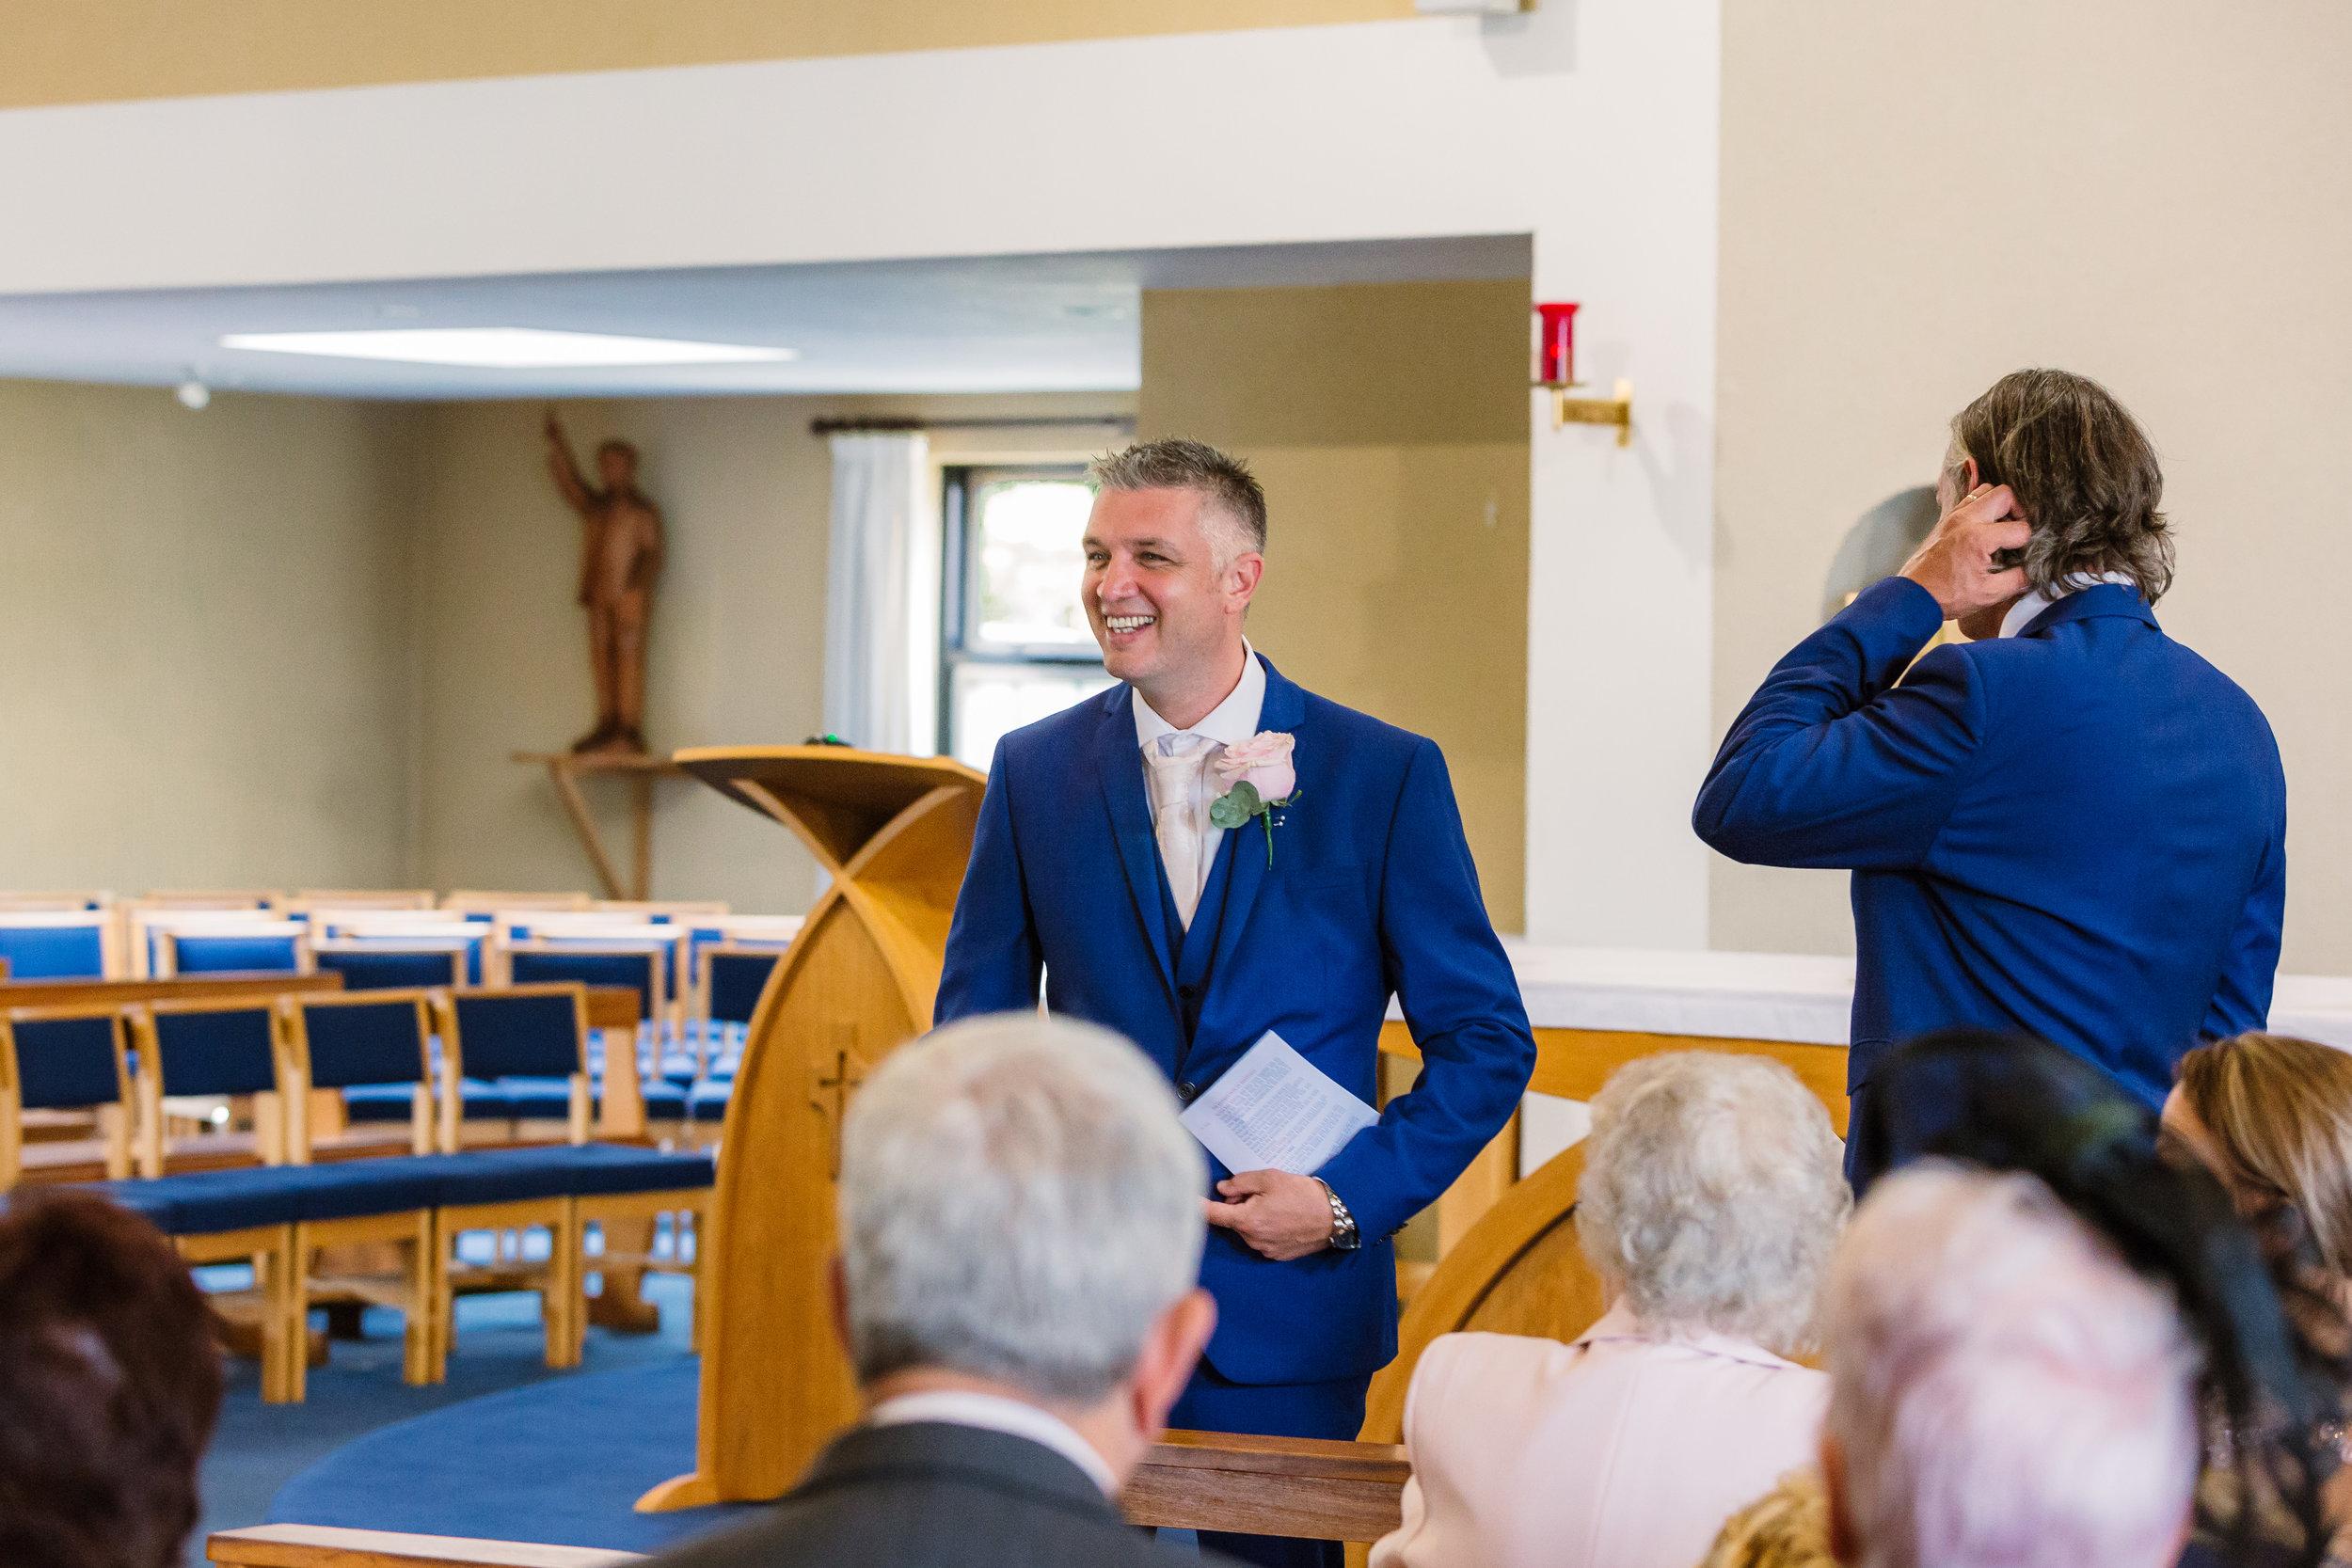 Sarah-Fishlock-Photography : Hampshire-wedding-photographer-hampshire : fleet-wedding-photographer-fleet : Meade-Hall-Wedding-Photographer : Meade-Hall-Wedding-Photos-395.jpg